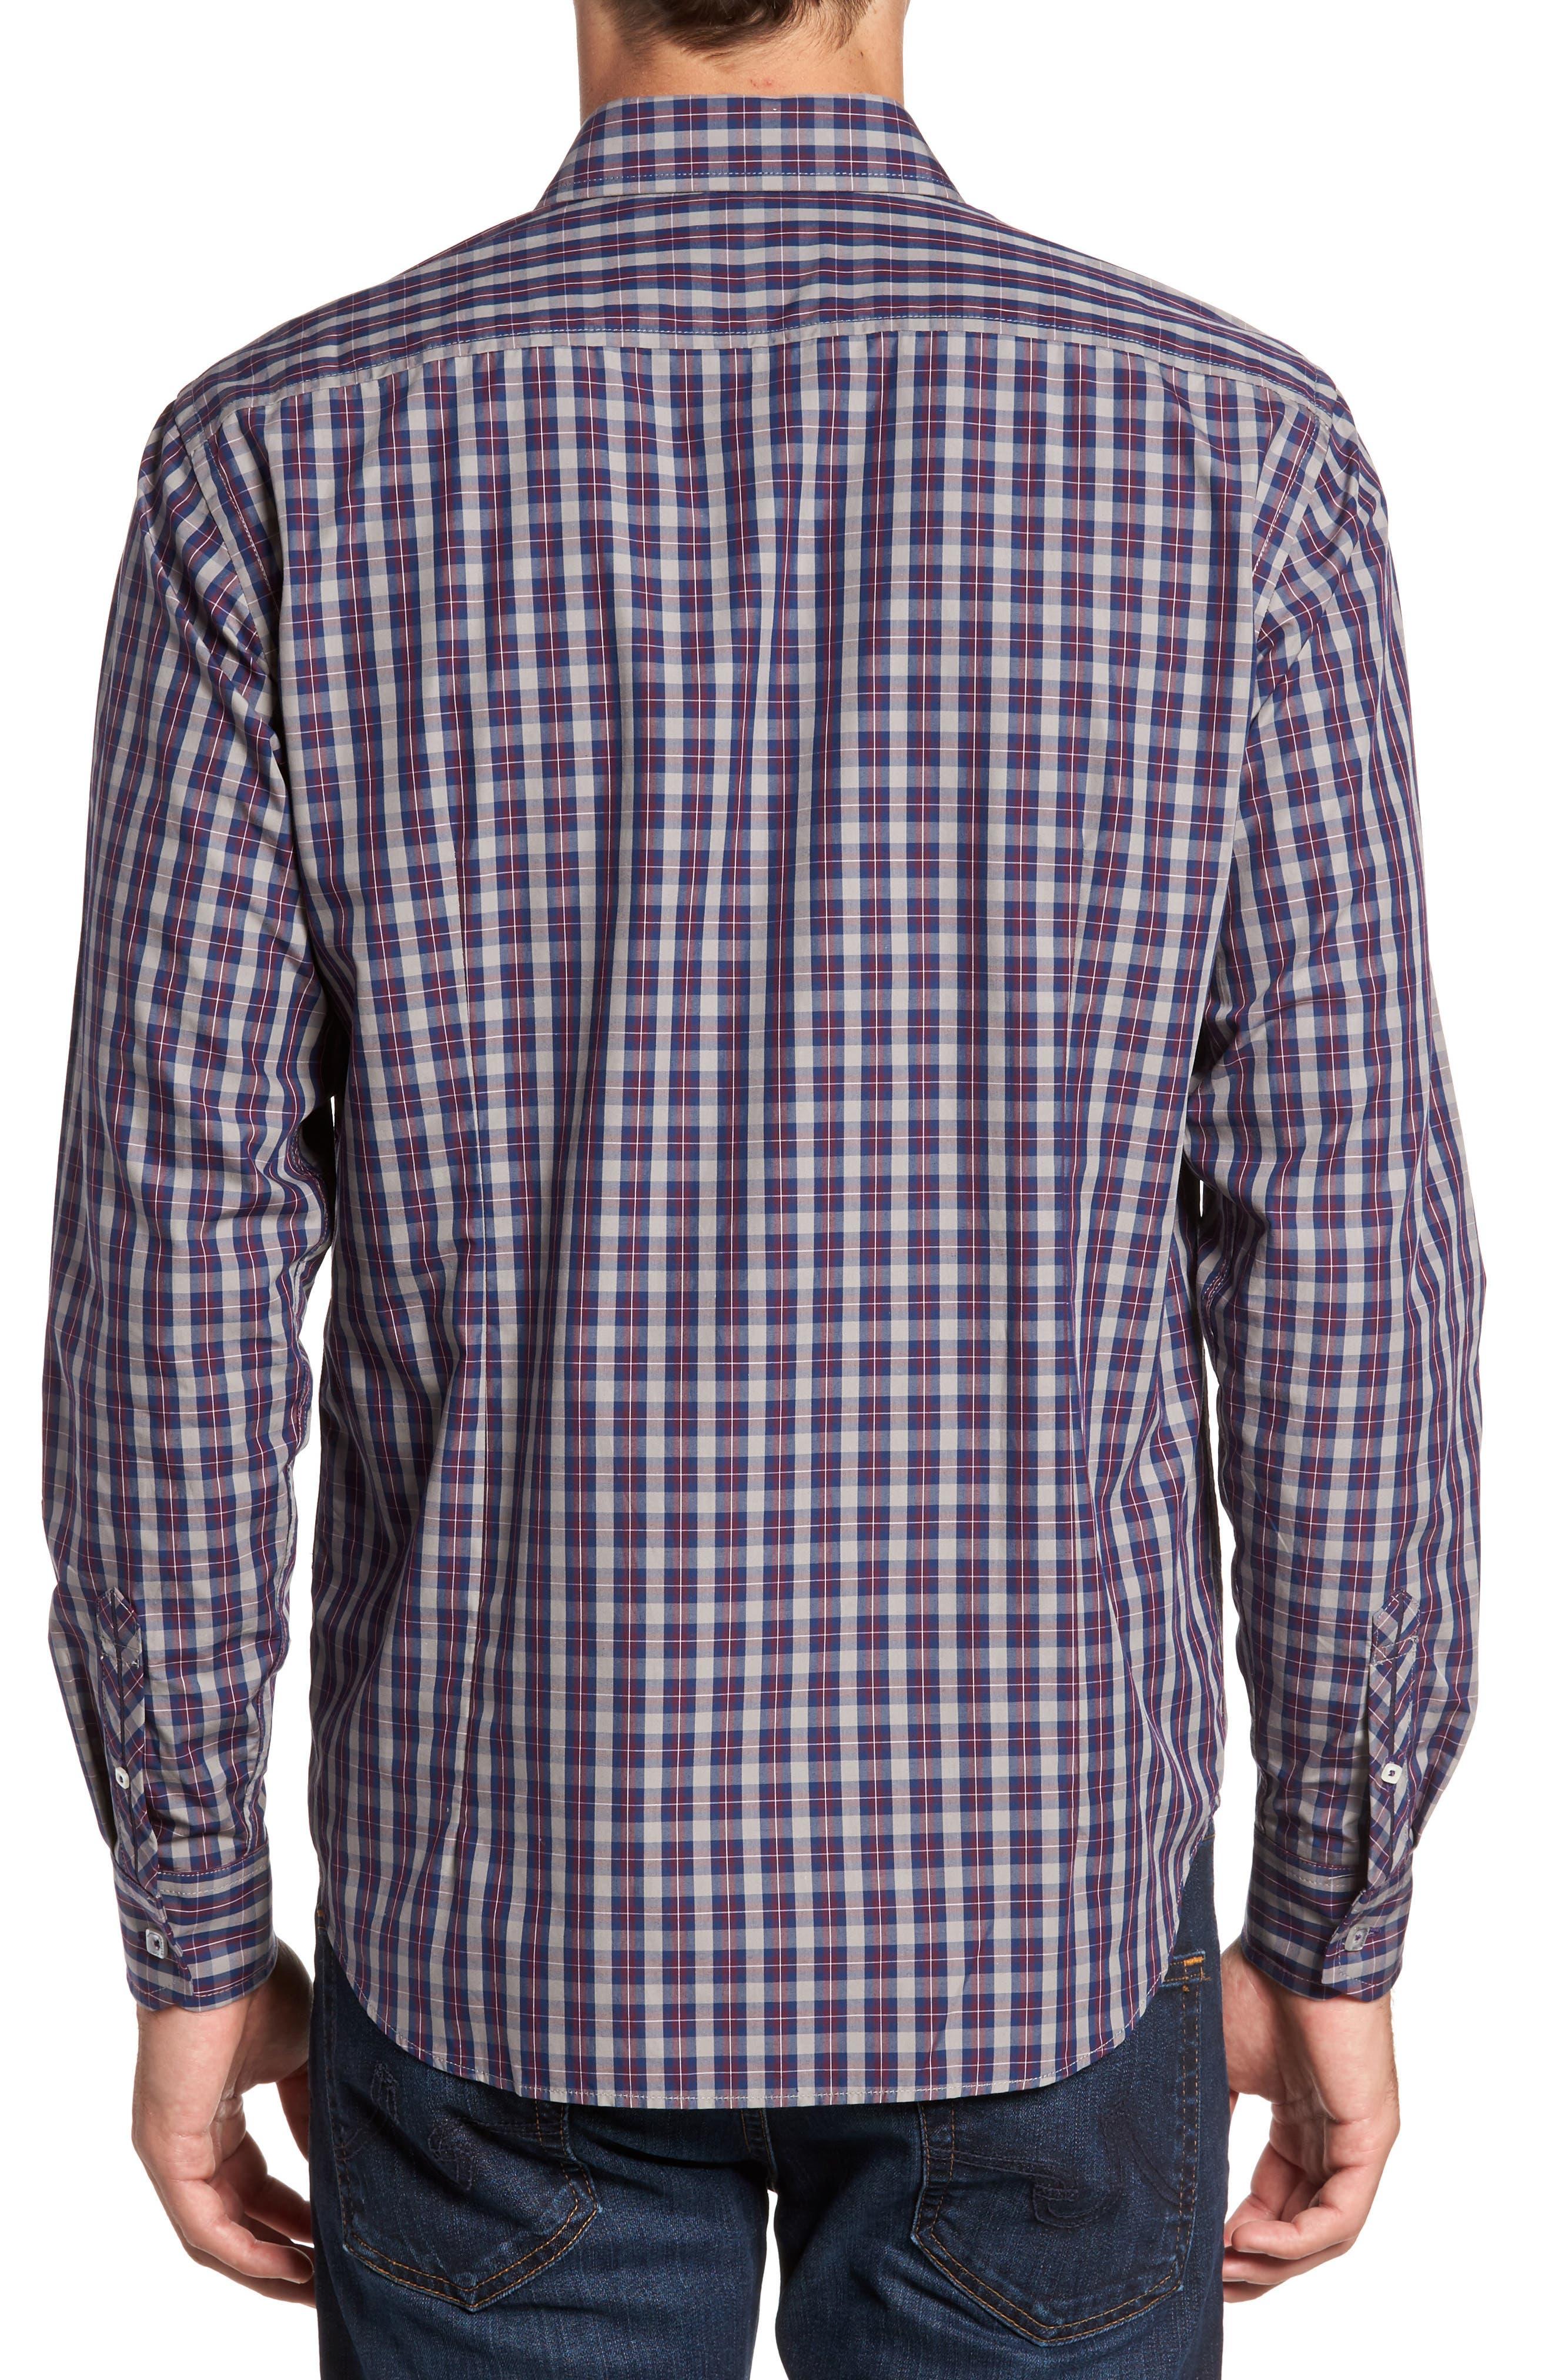 Regular Fit Plaid Sport Shirt,                             Alternate thumbnail 2, color,                             Burgundy